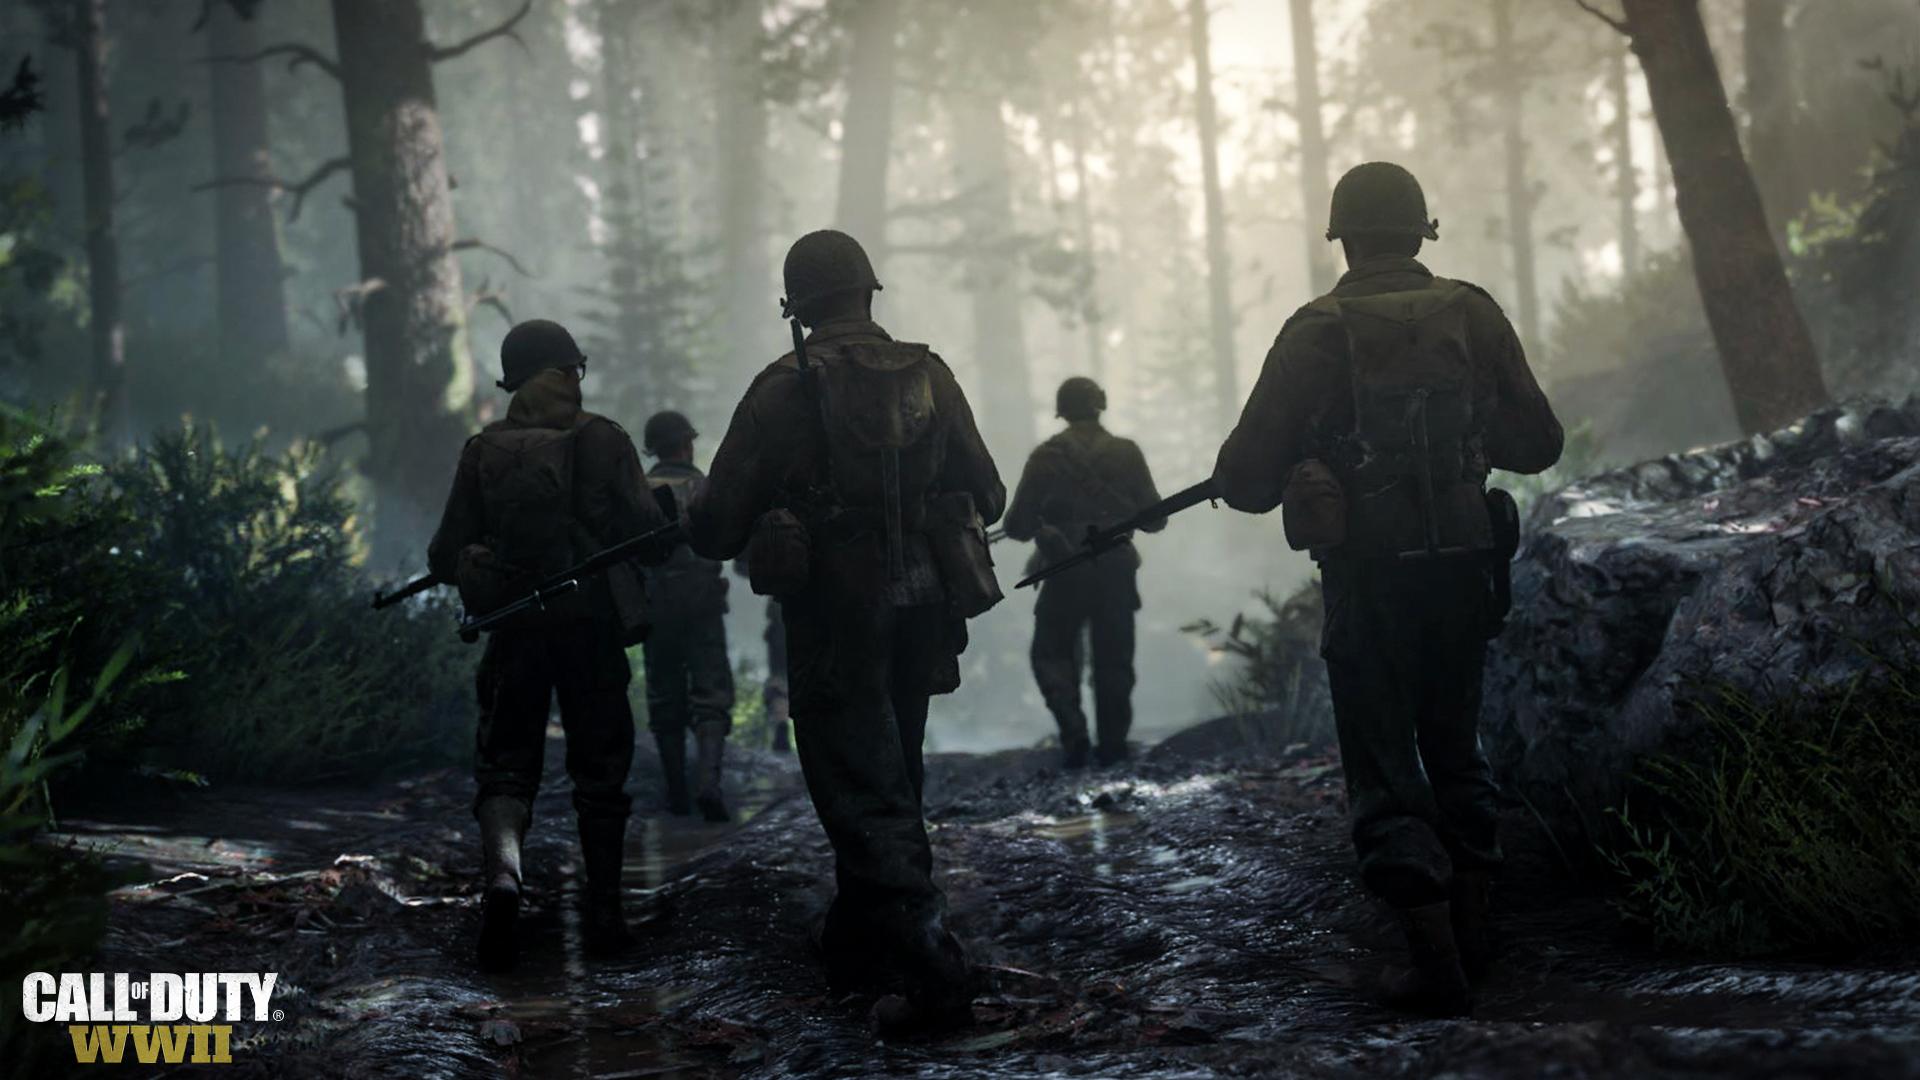 Screenshot of Call of Duty World War 2 game